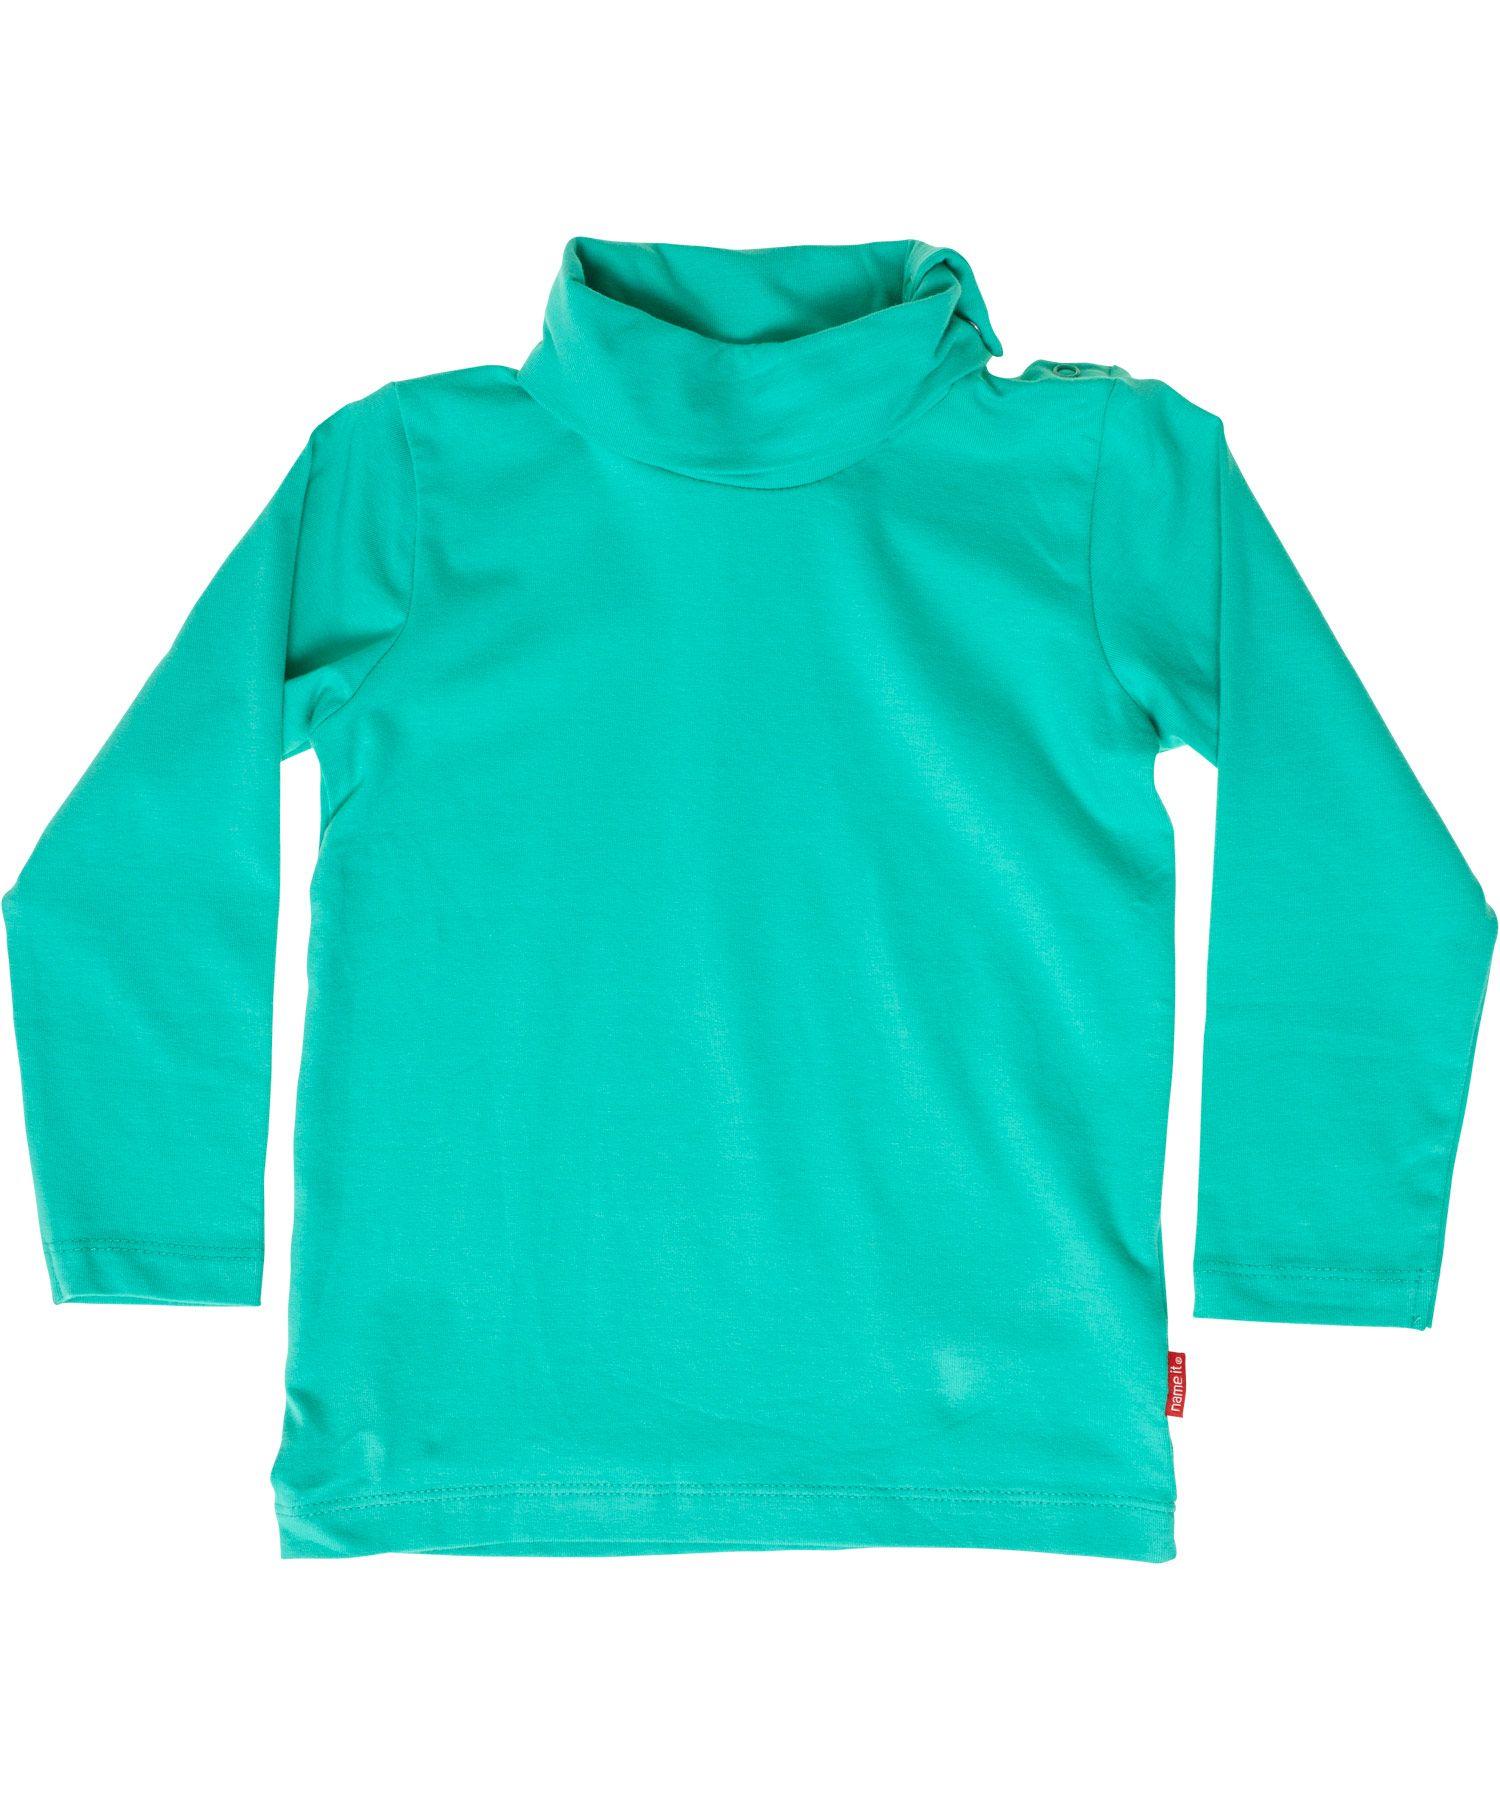 Name It muntgroene basis baby t-shirt met rolkraagje en knopjes. name-it.nl.emilea.be